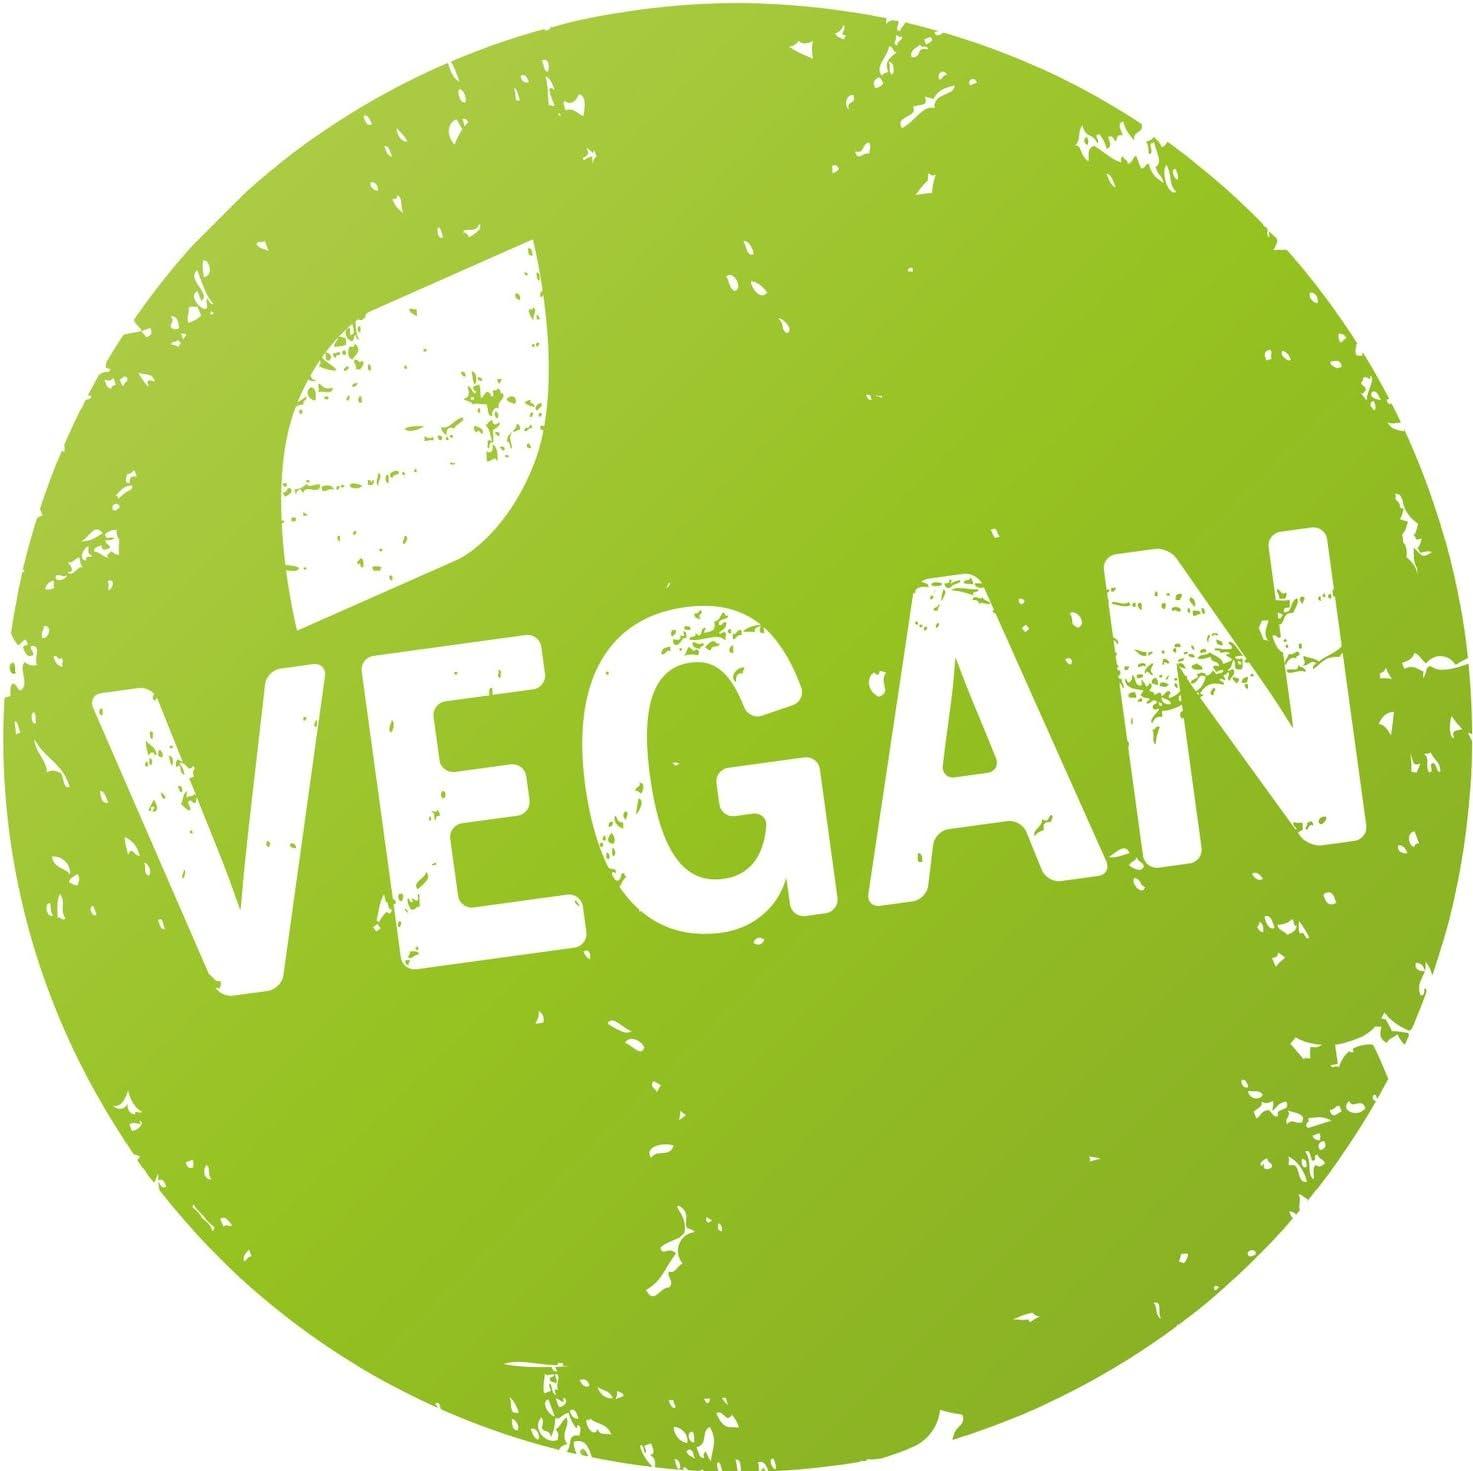 Finest Folia 500x Produkt Aufkleber Bio Vegan Glutenfrei Laktosefrei Vegetarisch R002 Vegan Auto